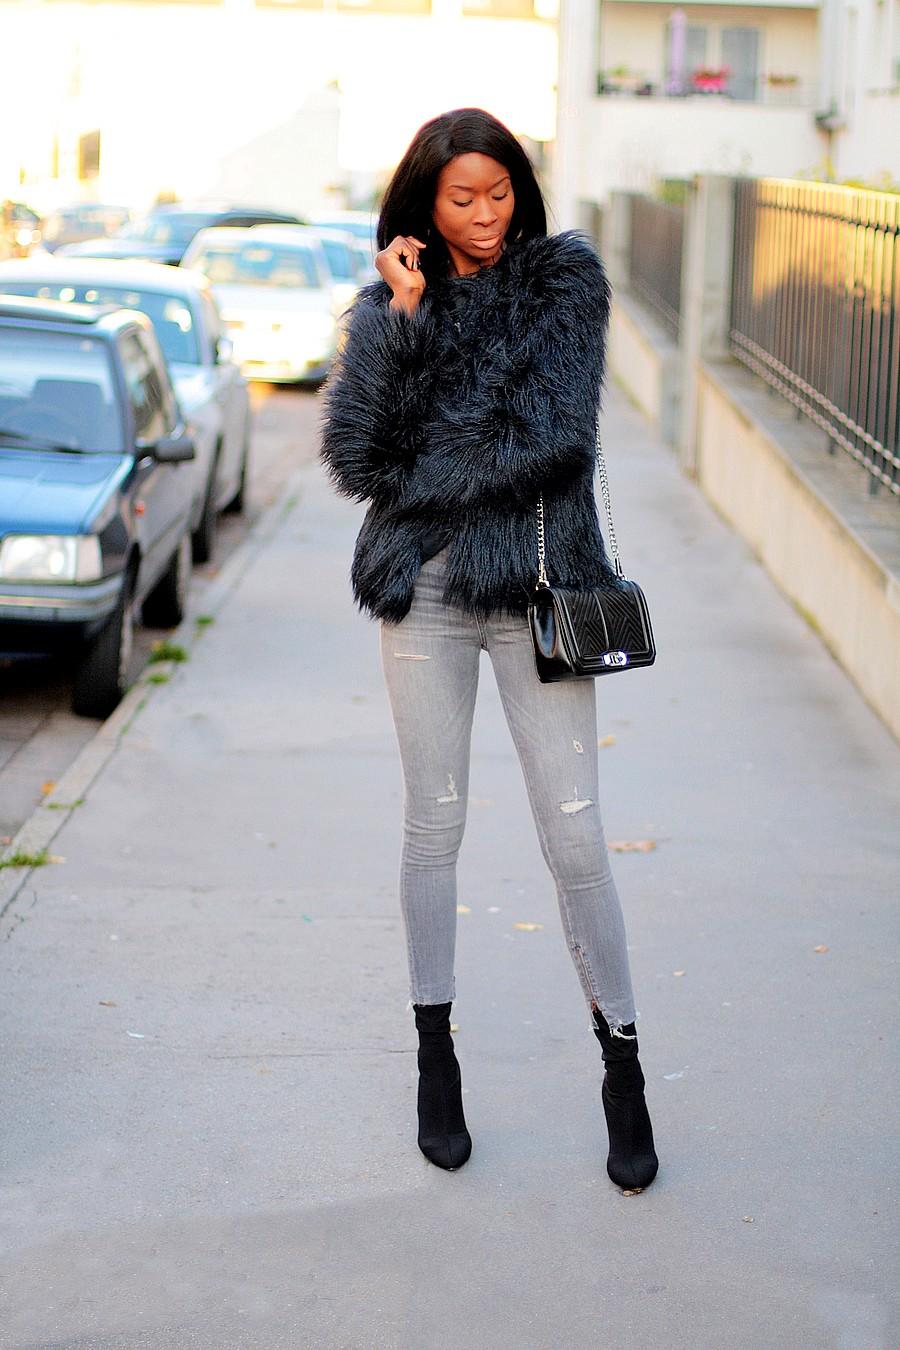 bottines-chaussettes-kim-kardashian-style-jeans-taille-haute-manteau-fausse-fourrure